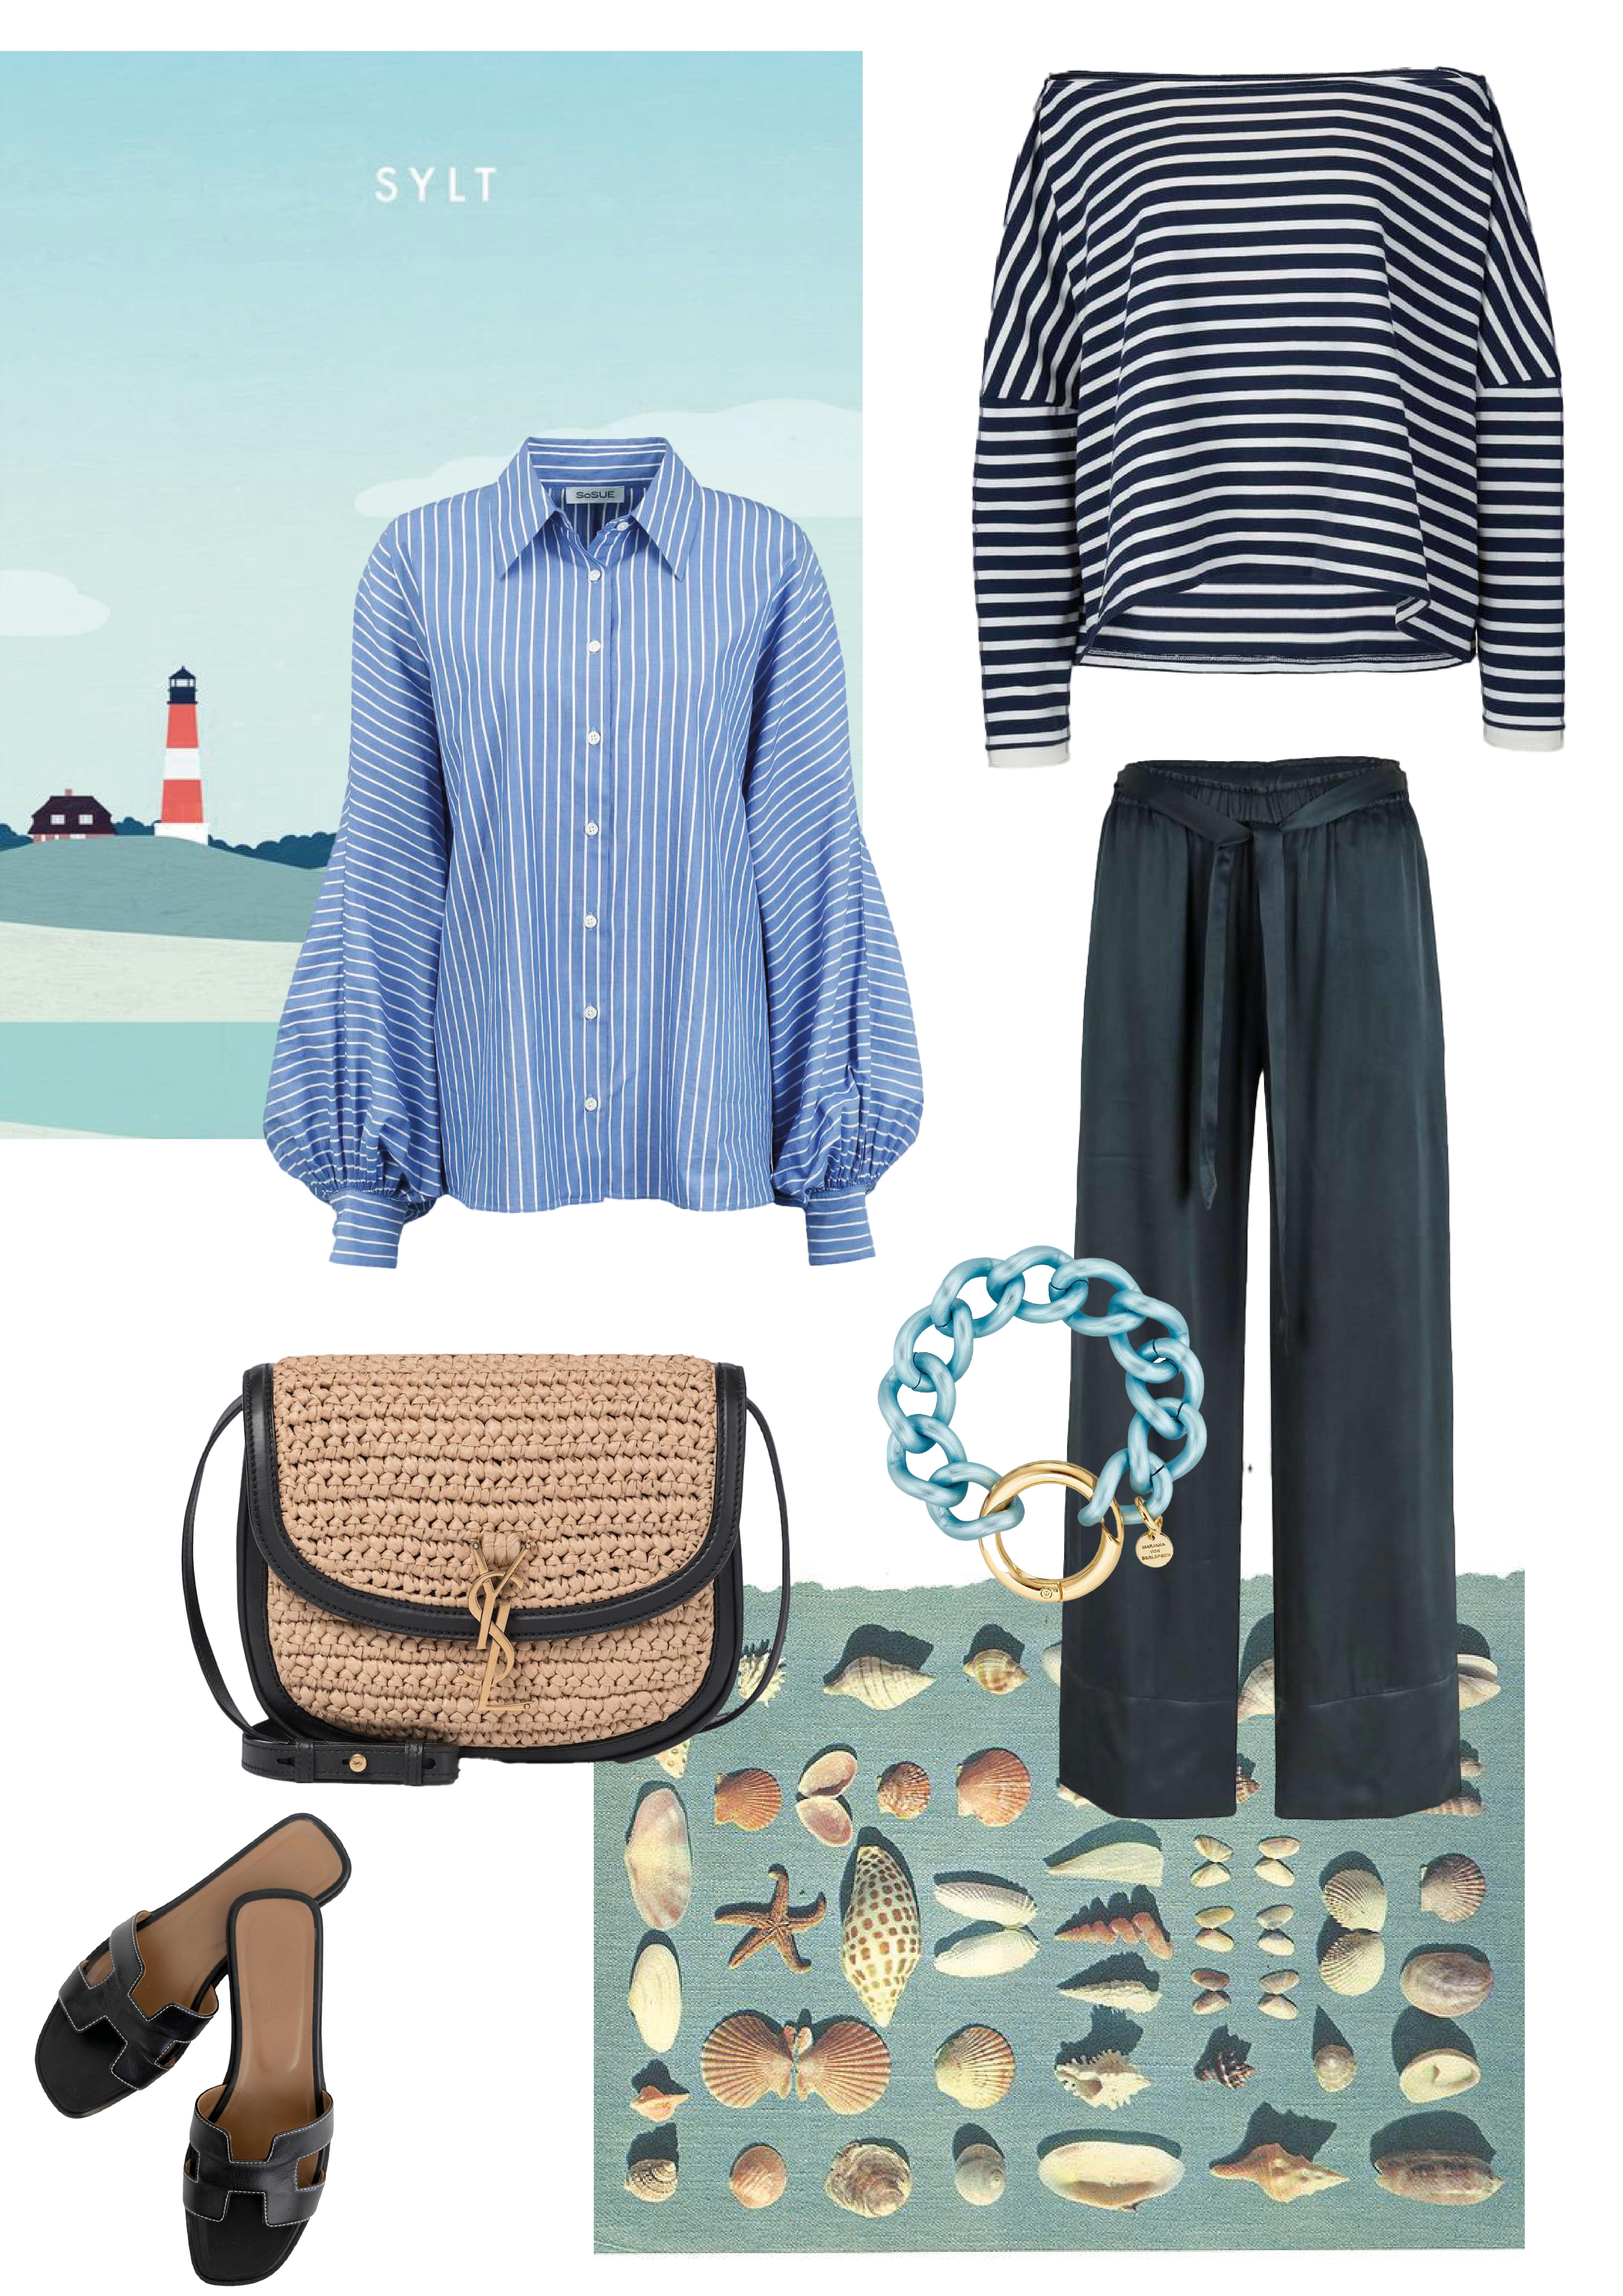 Bluse: SoSUE Antonia Stripes Shirt: SoSUE Sailor Shirt Hose: SoSUE PJ Pants Sandalen: Hermes Tasche: Saint Laurent Schmuck: Marjana von Berlepsch